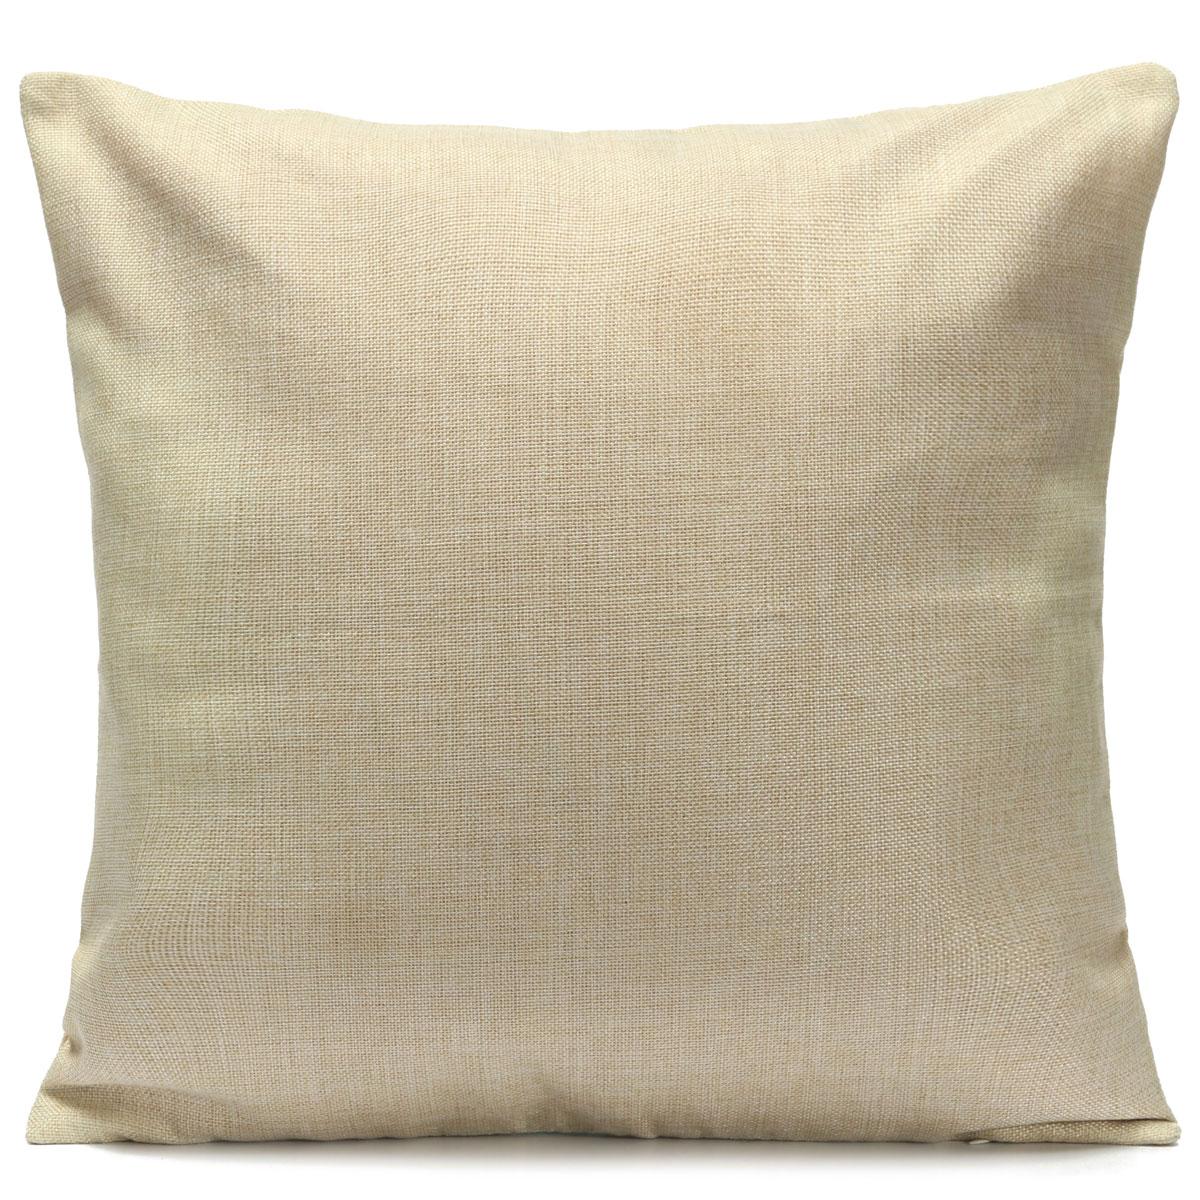 Black Cotton Throw Pillows : Vintage Black & White Cotton Linen Throw Cushion Cover Pillow Case Home Decor Lazada Malaysia